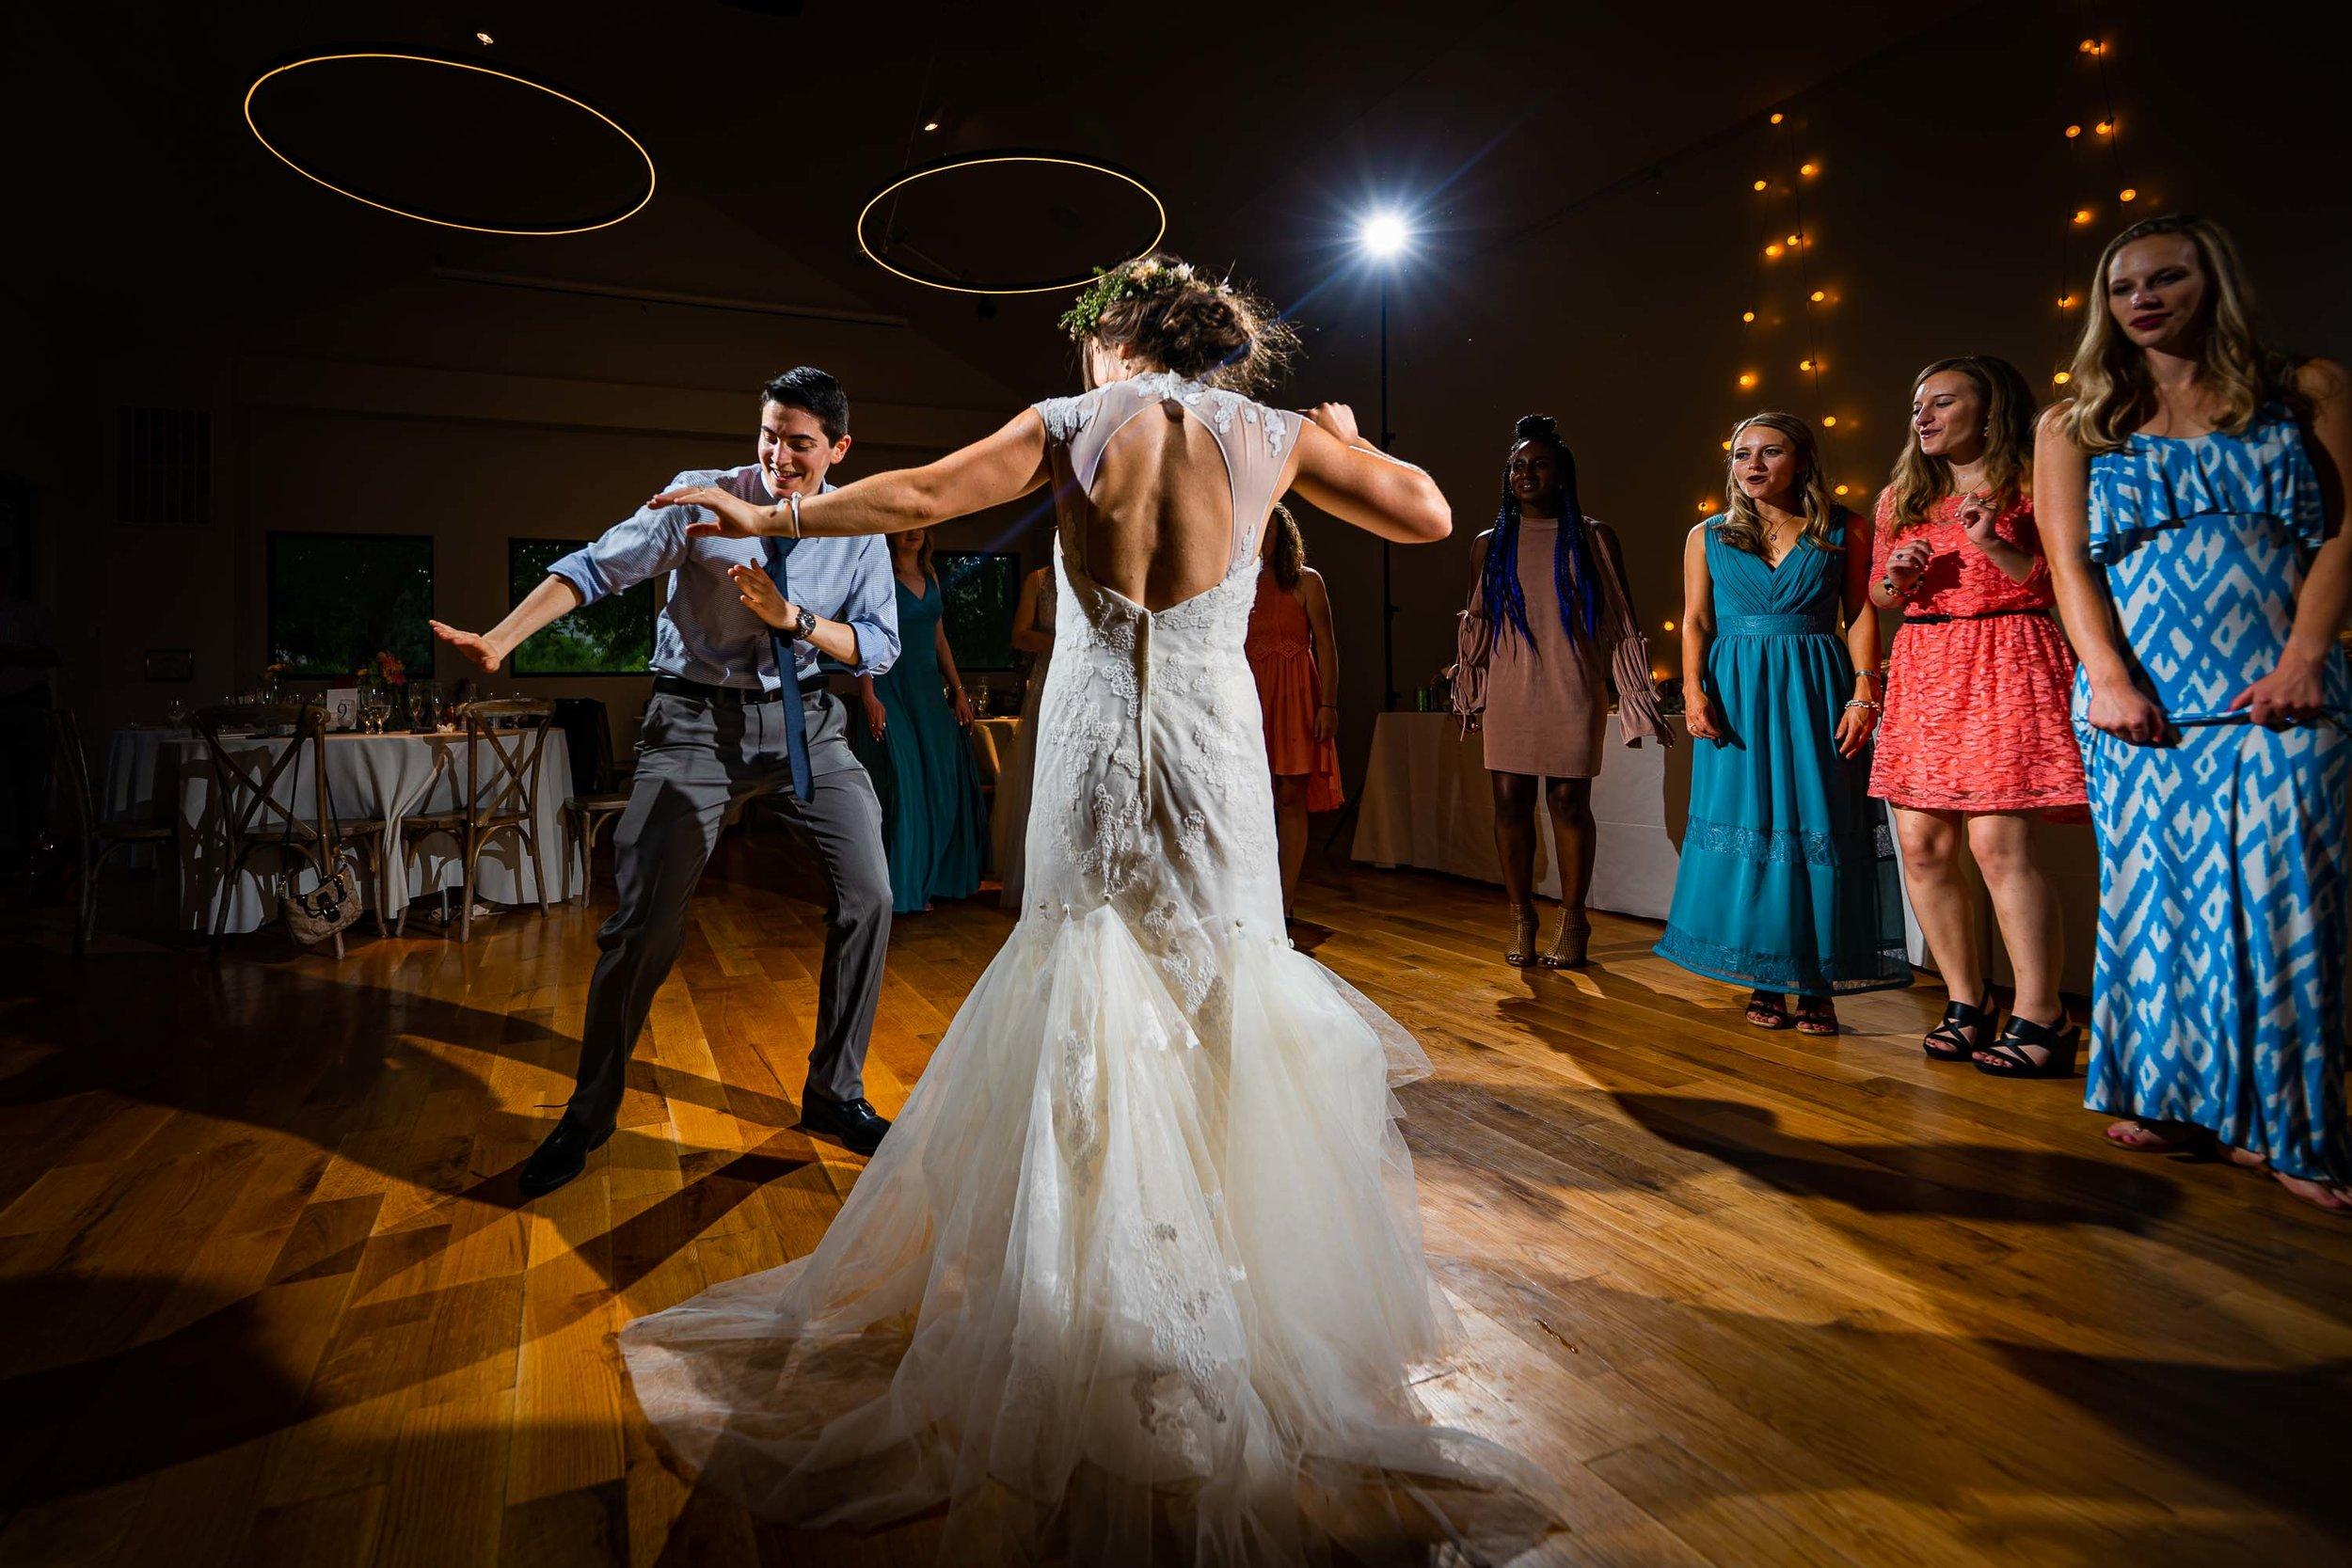 Rist_Canyon_Inn_Laporte_Wedding-180.jpg